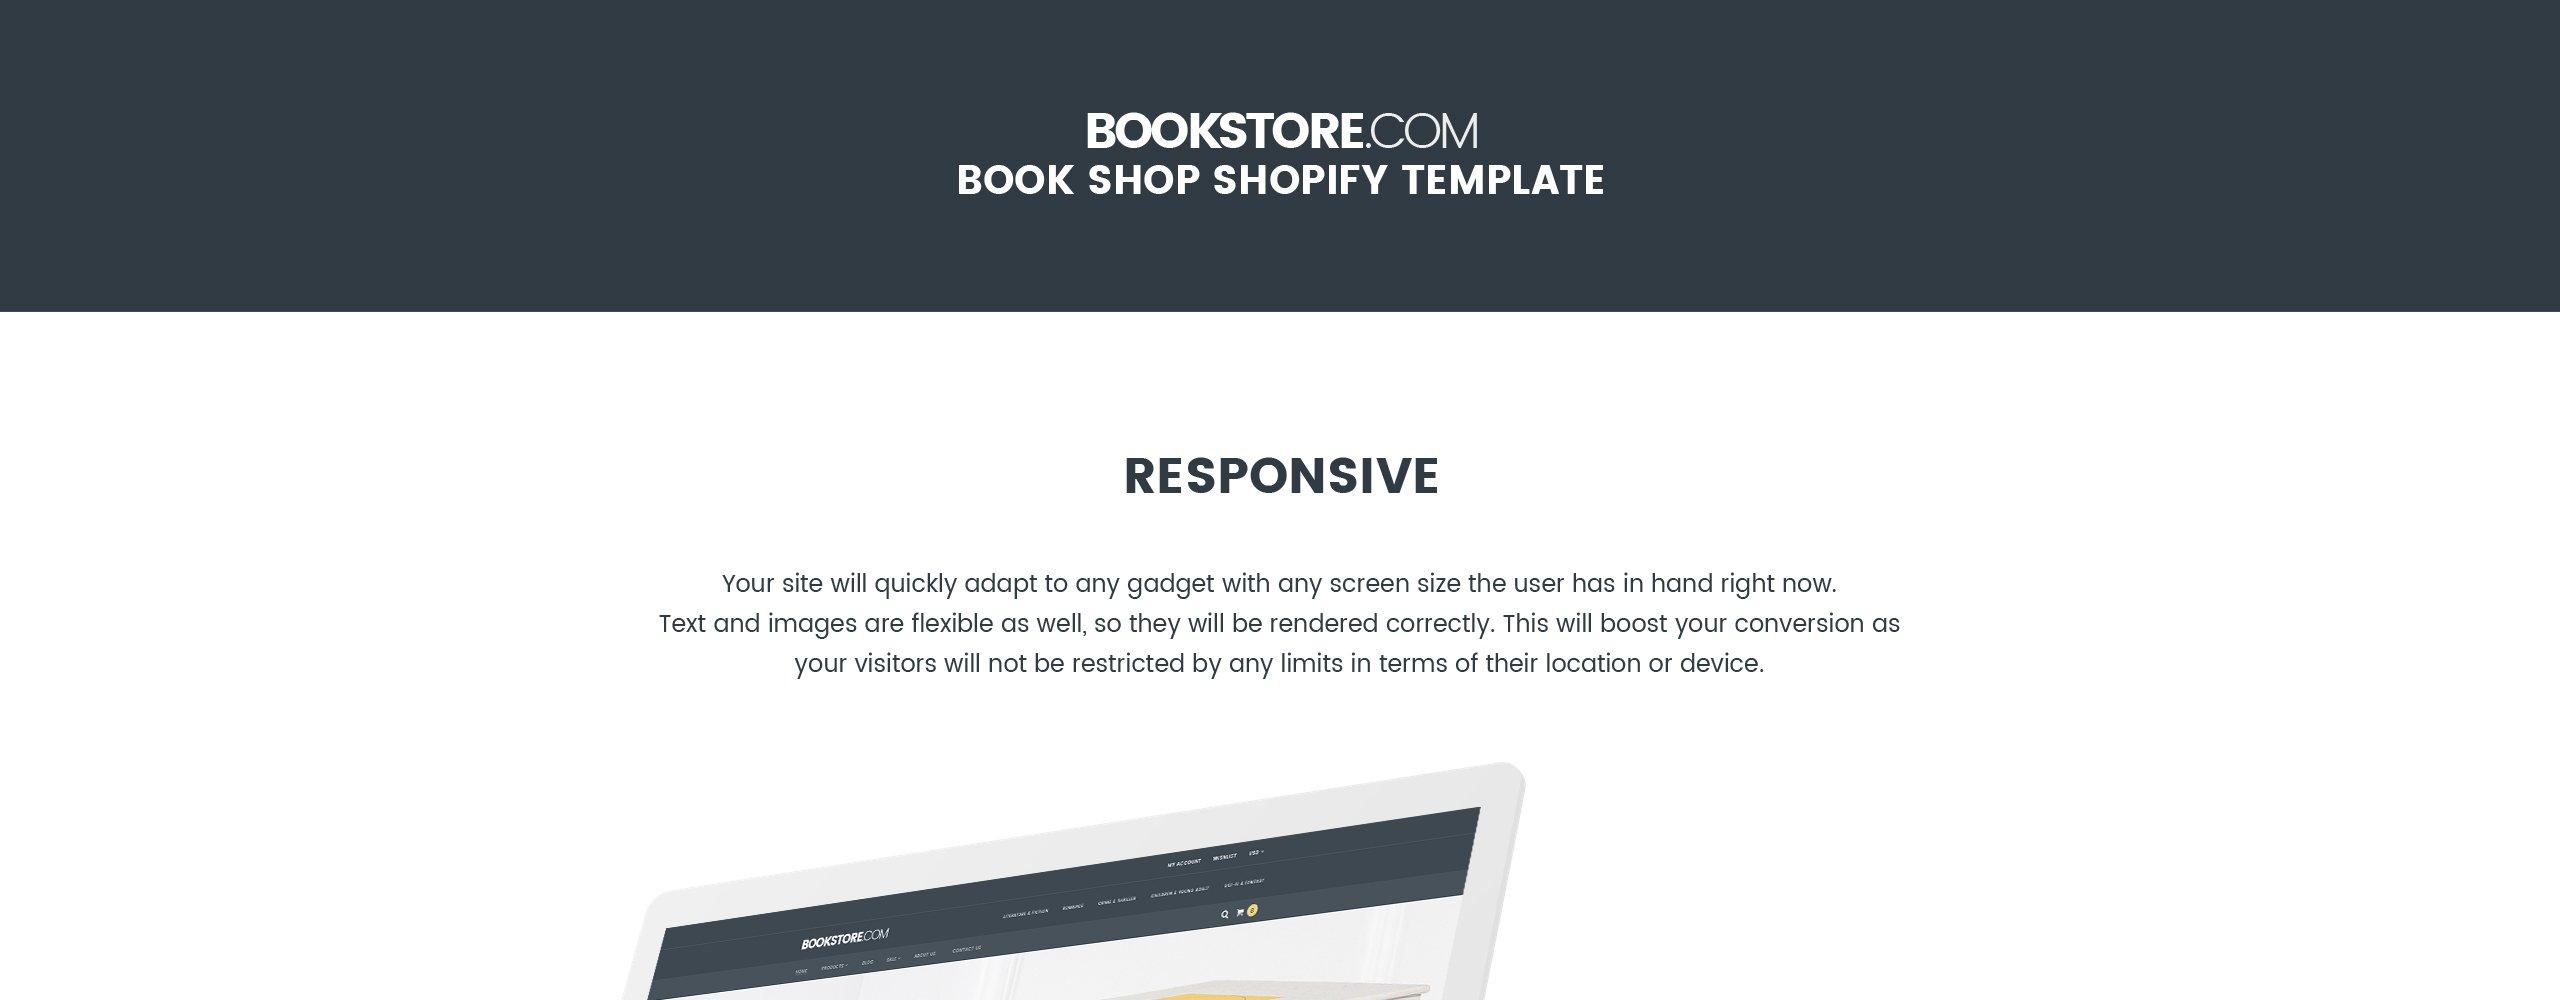 Bookstore.com Books  Responsive Shopify  Theme